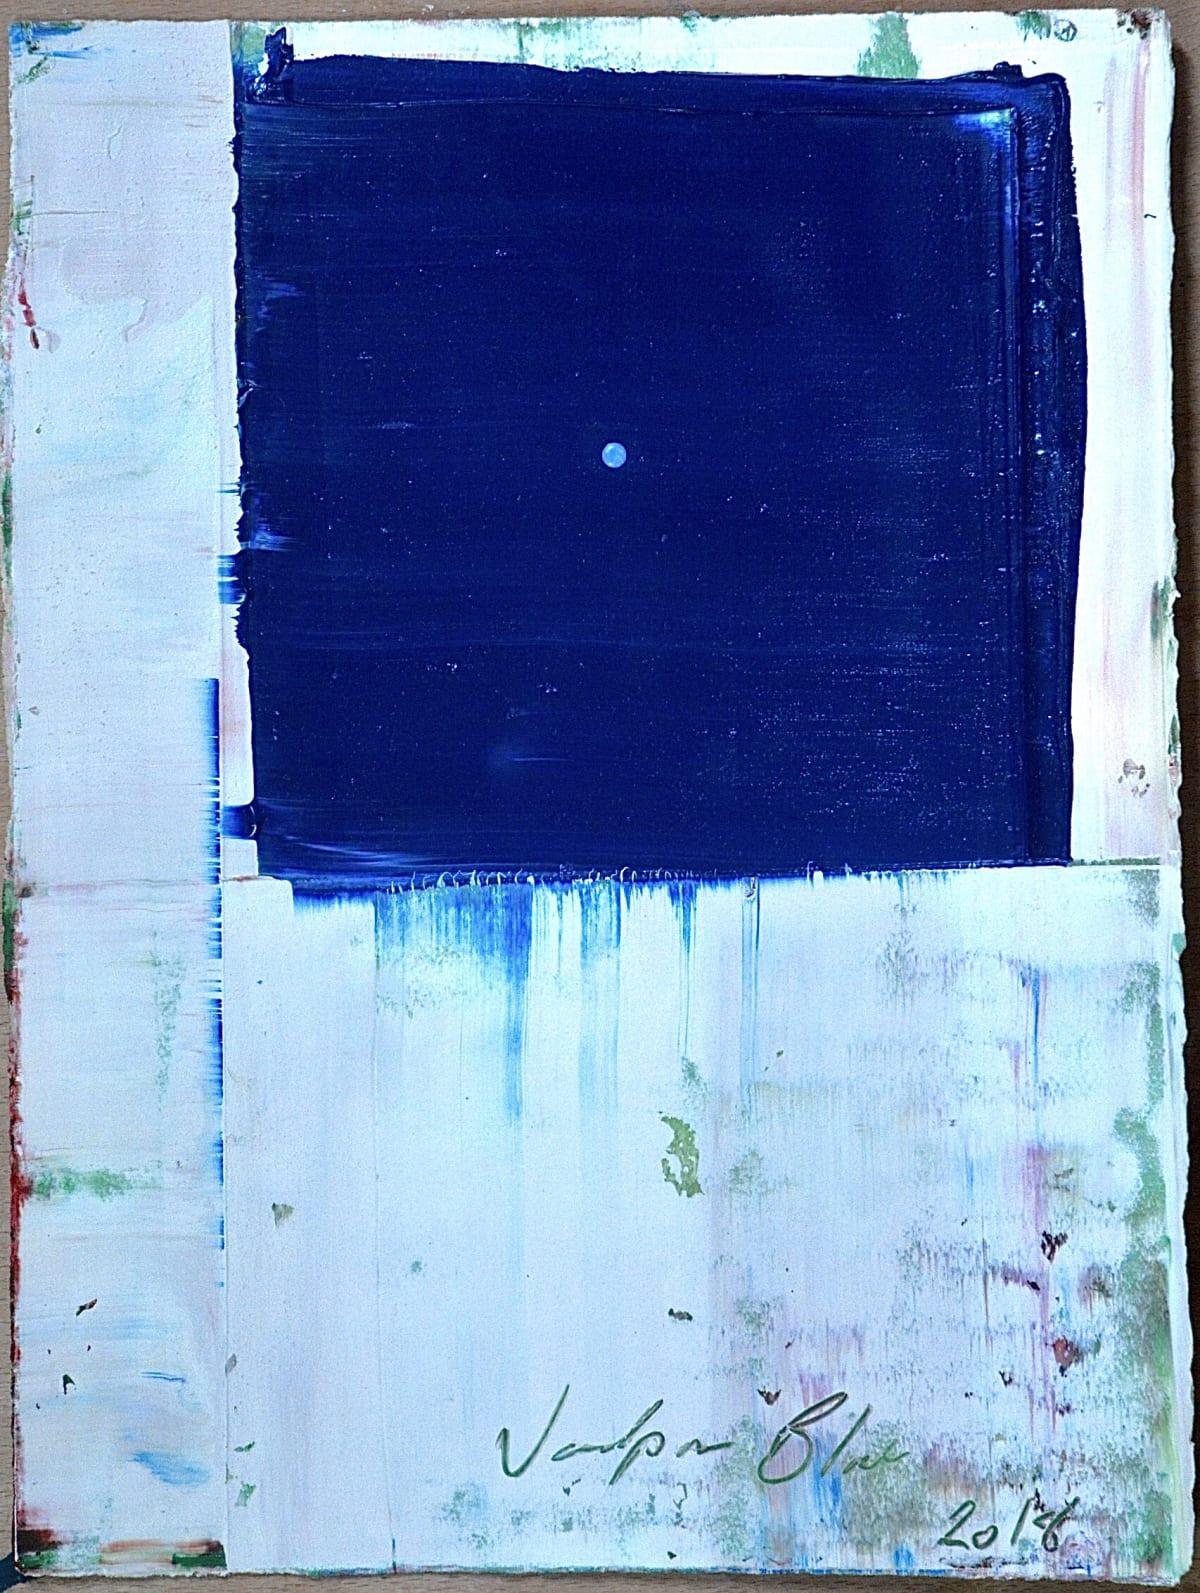 Marcus Hodge, Tantric 2, Jodhpur Blue, 2018